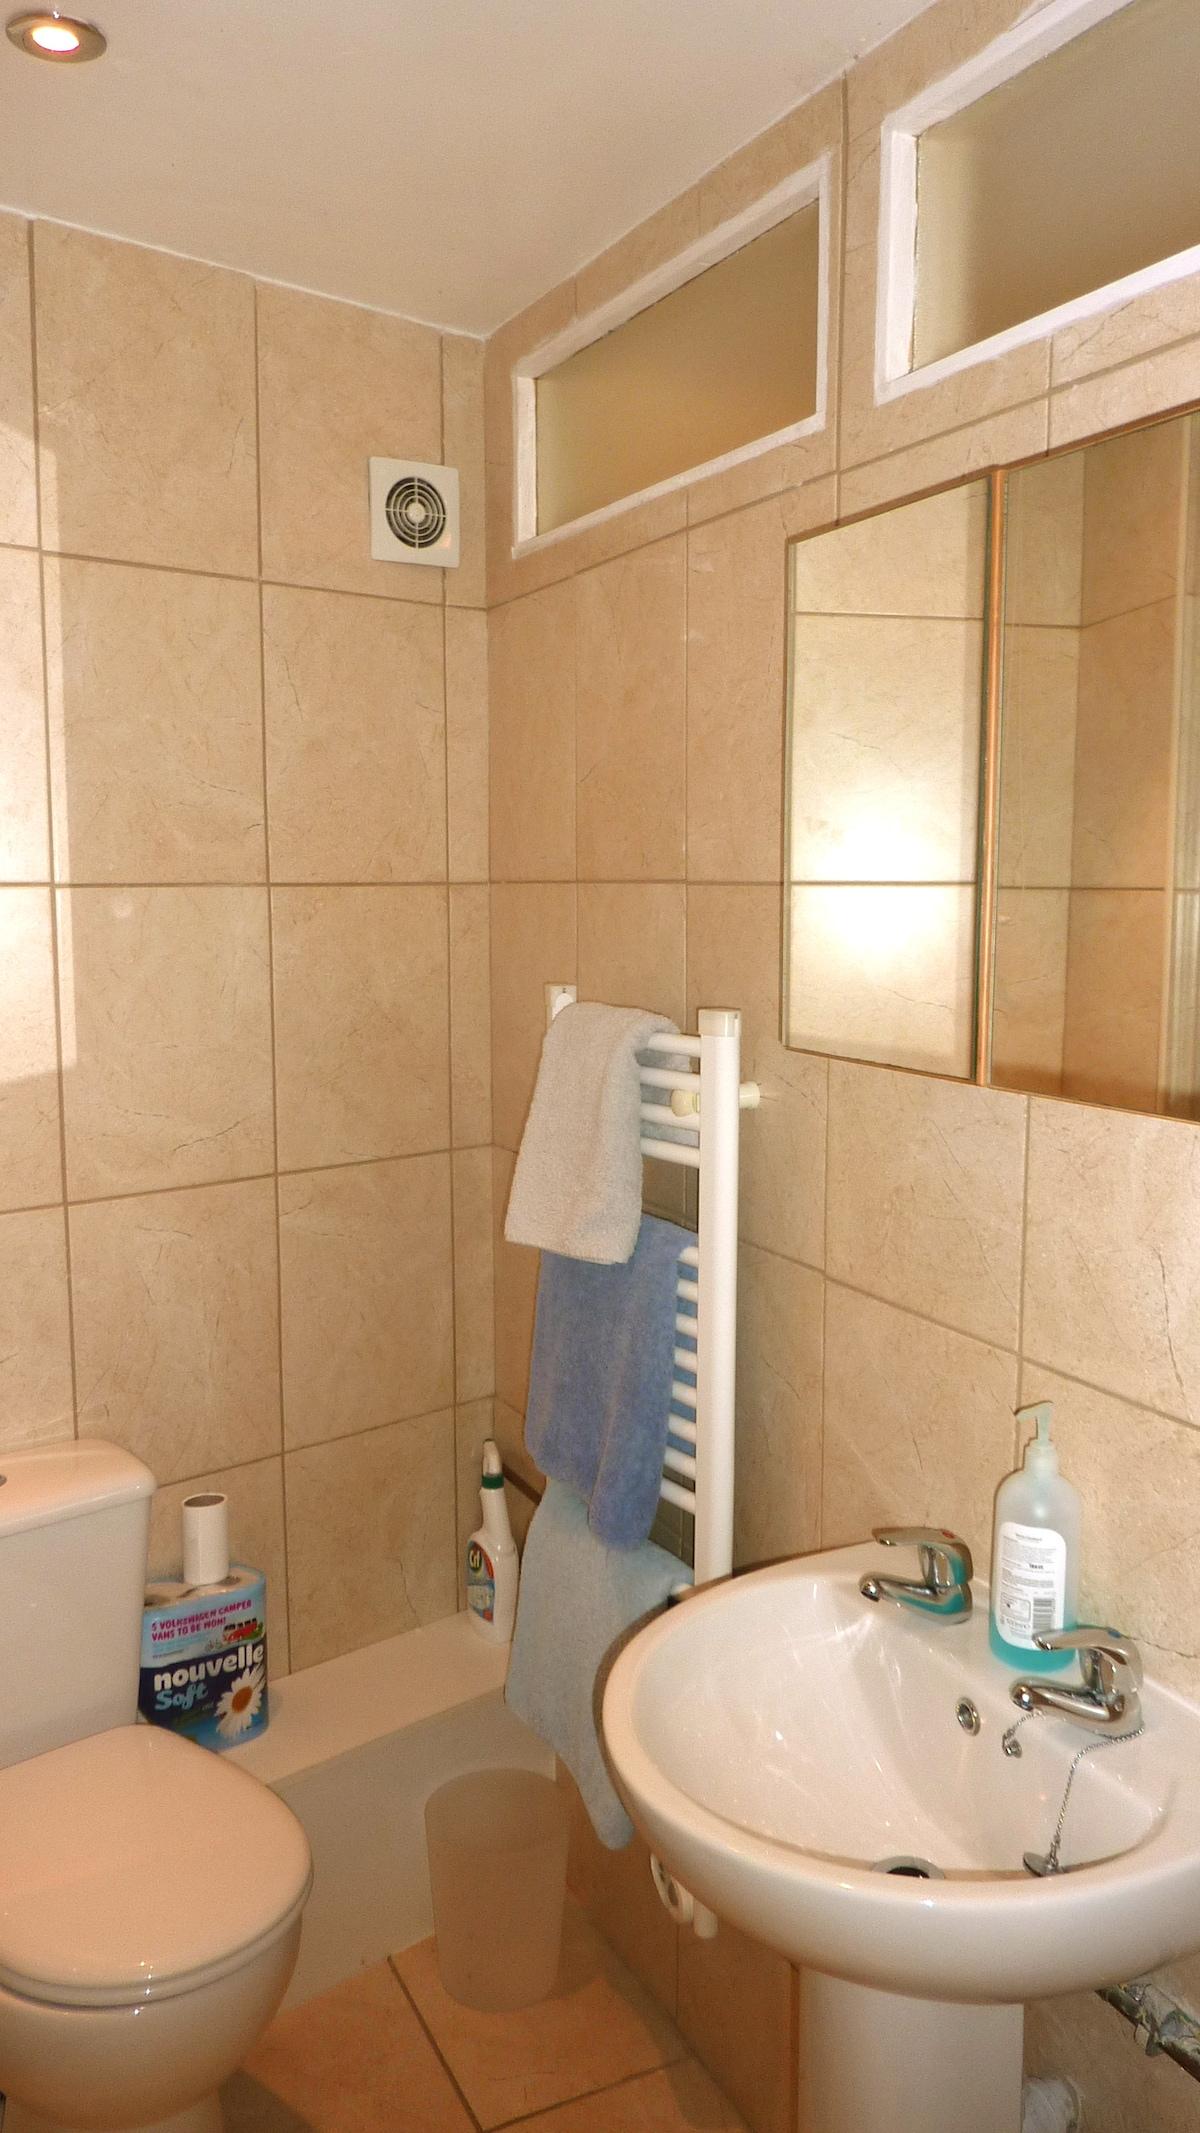 Clean and warm bathroom